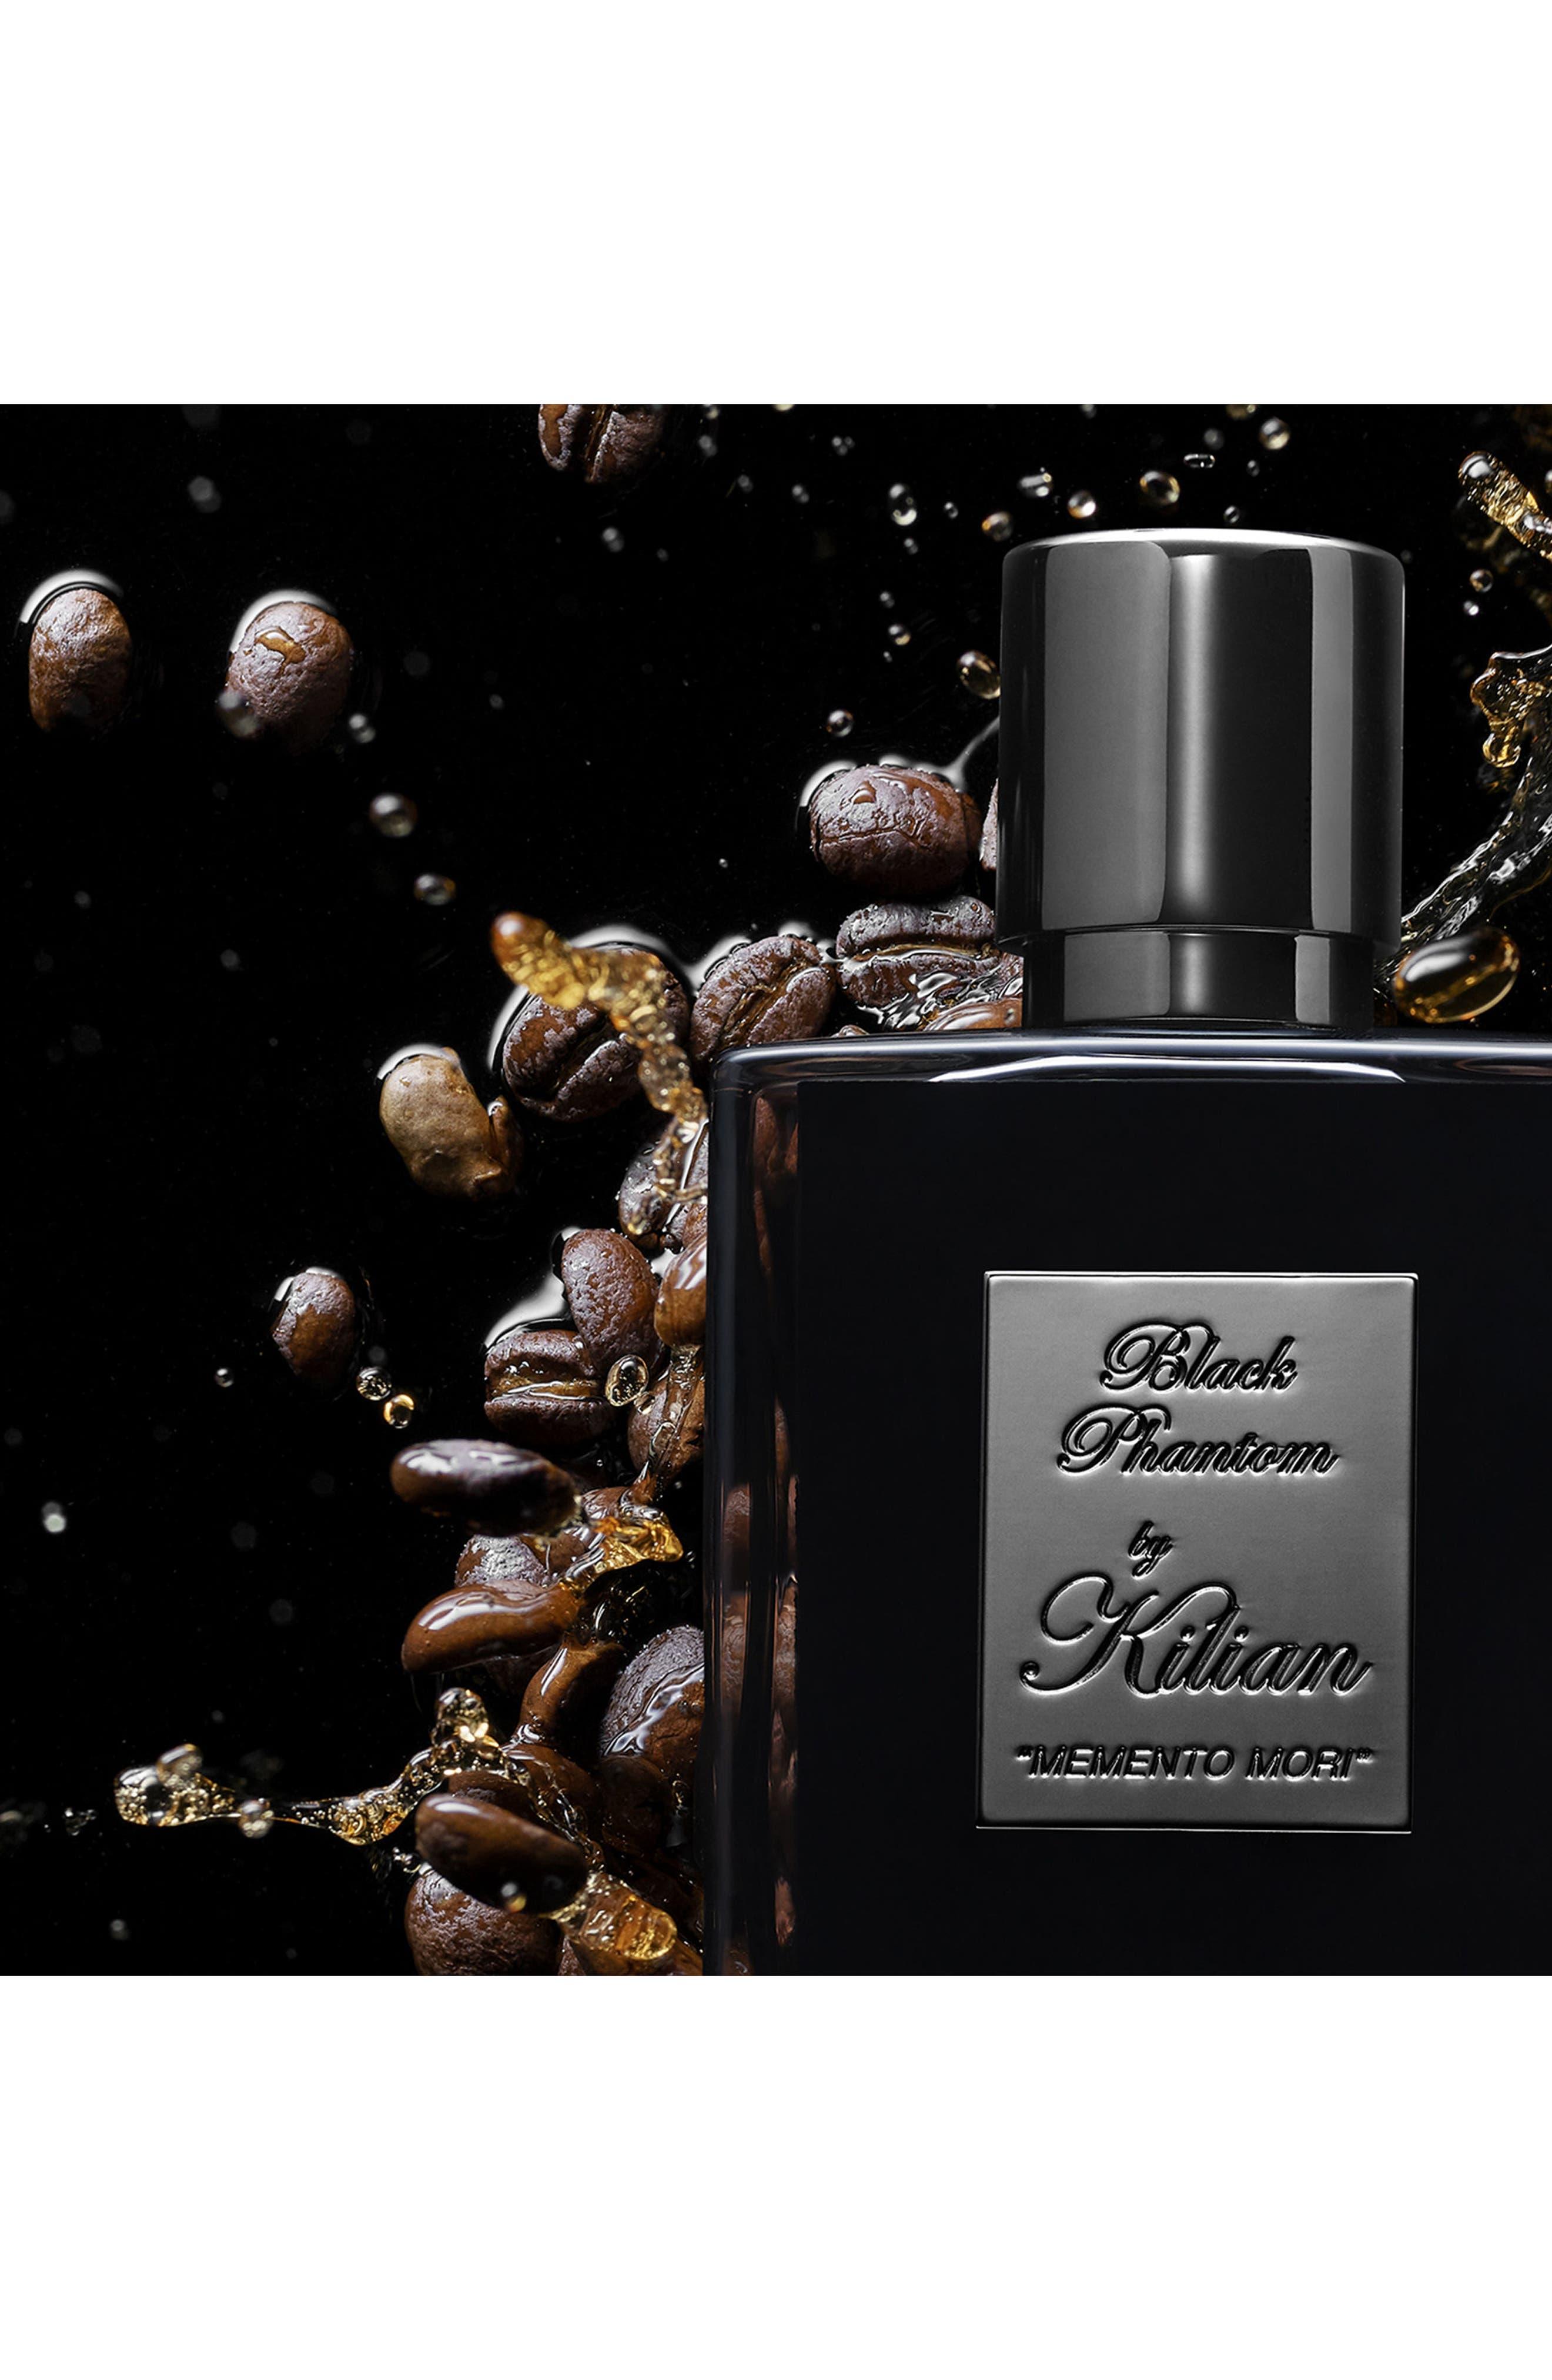 Black Phantom Memento Mori Eau de Parfum Mini Carafe,                             Alternate thumbnail 5, color,                             NO COLOR